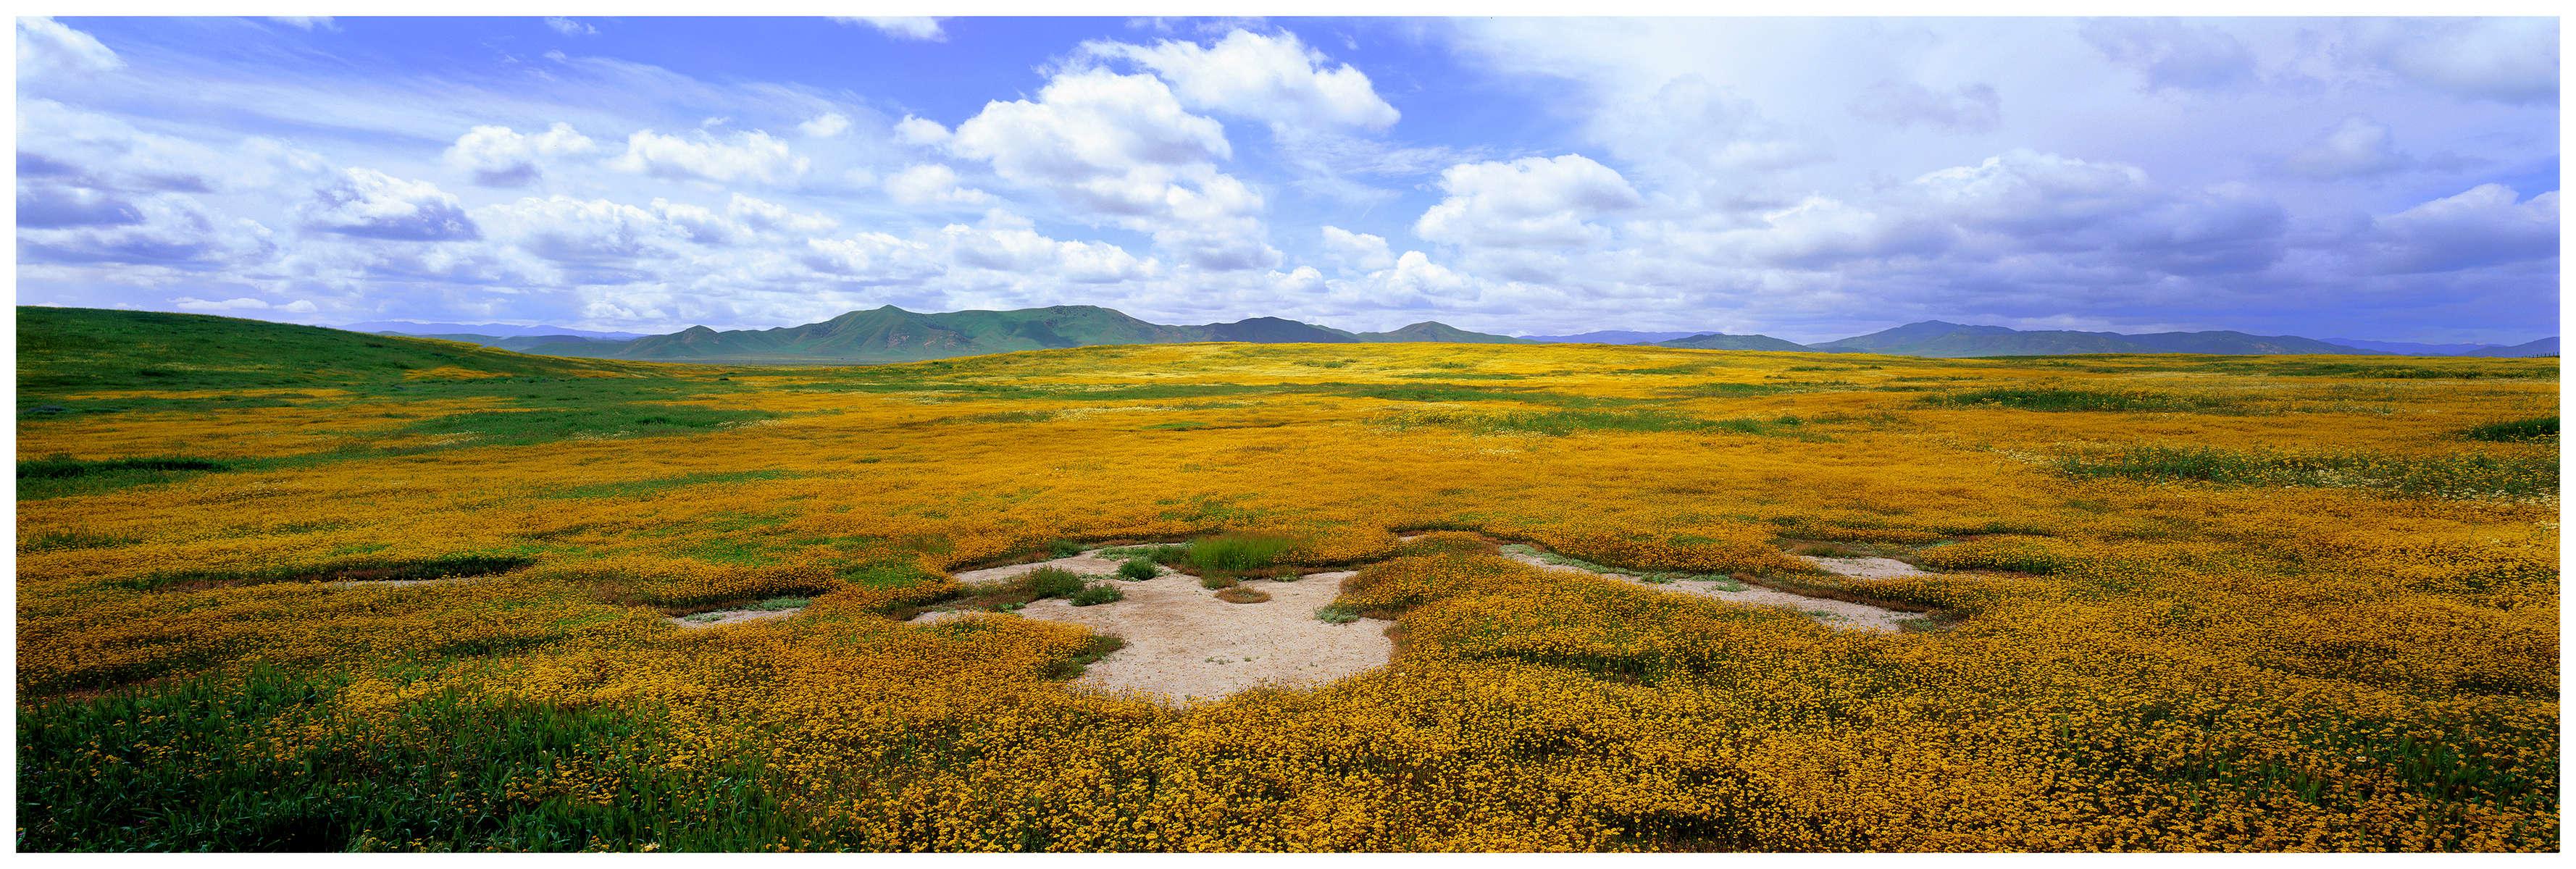 essays on landscape photography